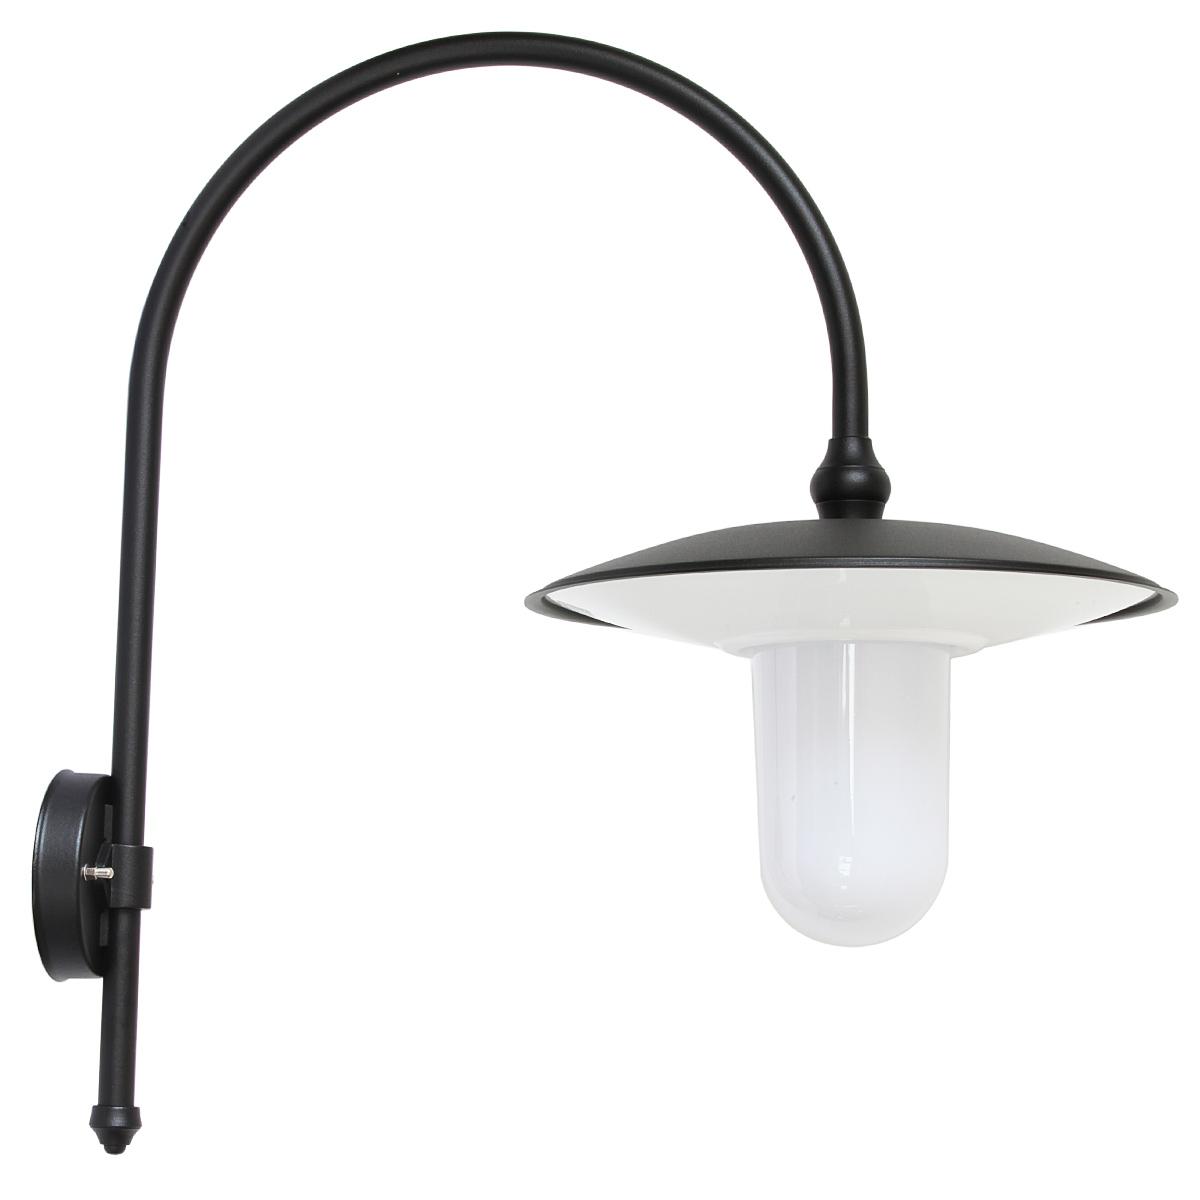 gro e italienische wandlampe f r au en mit bogenarm terra lumi. Black Bedroom Furniture Sets. Home Design Ideas